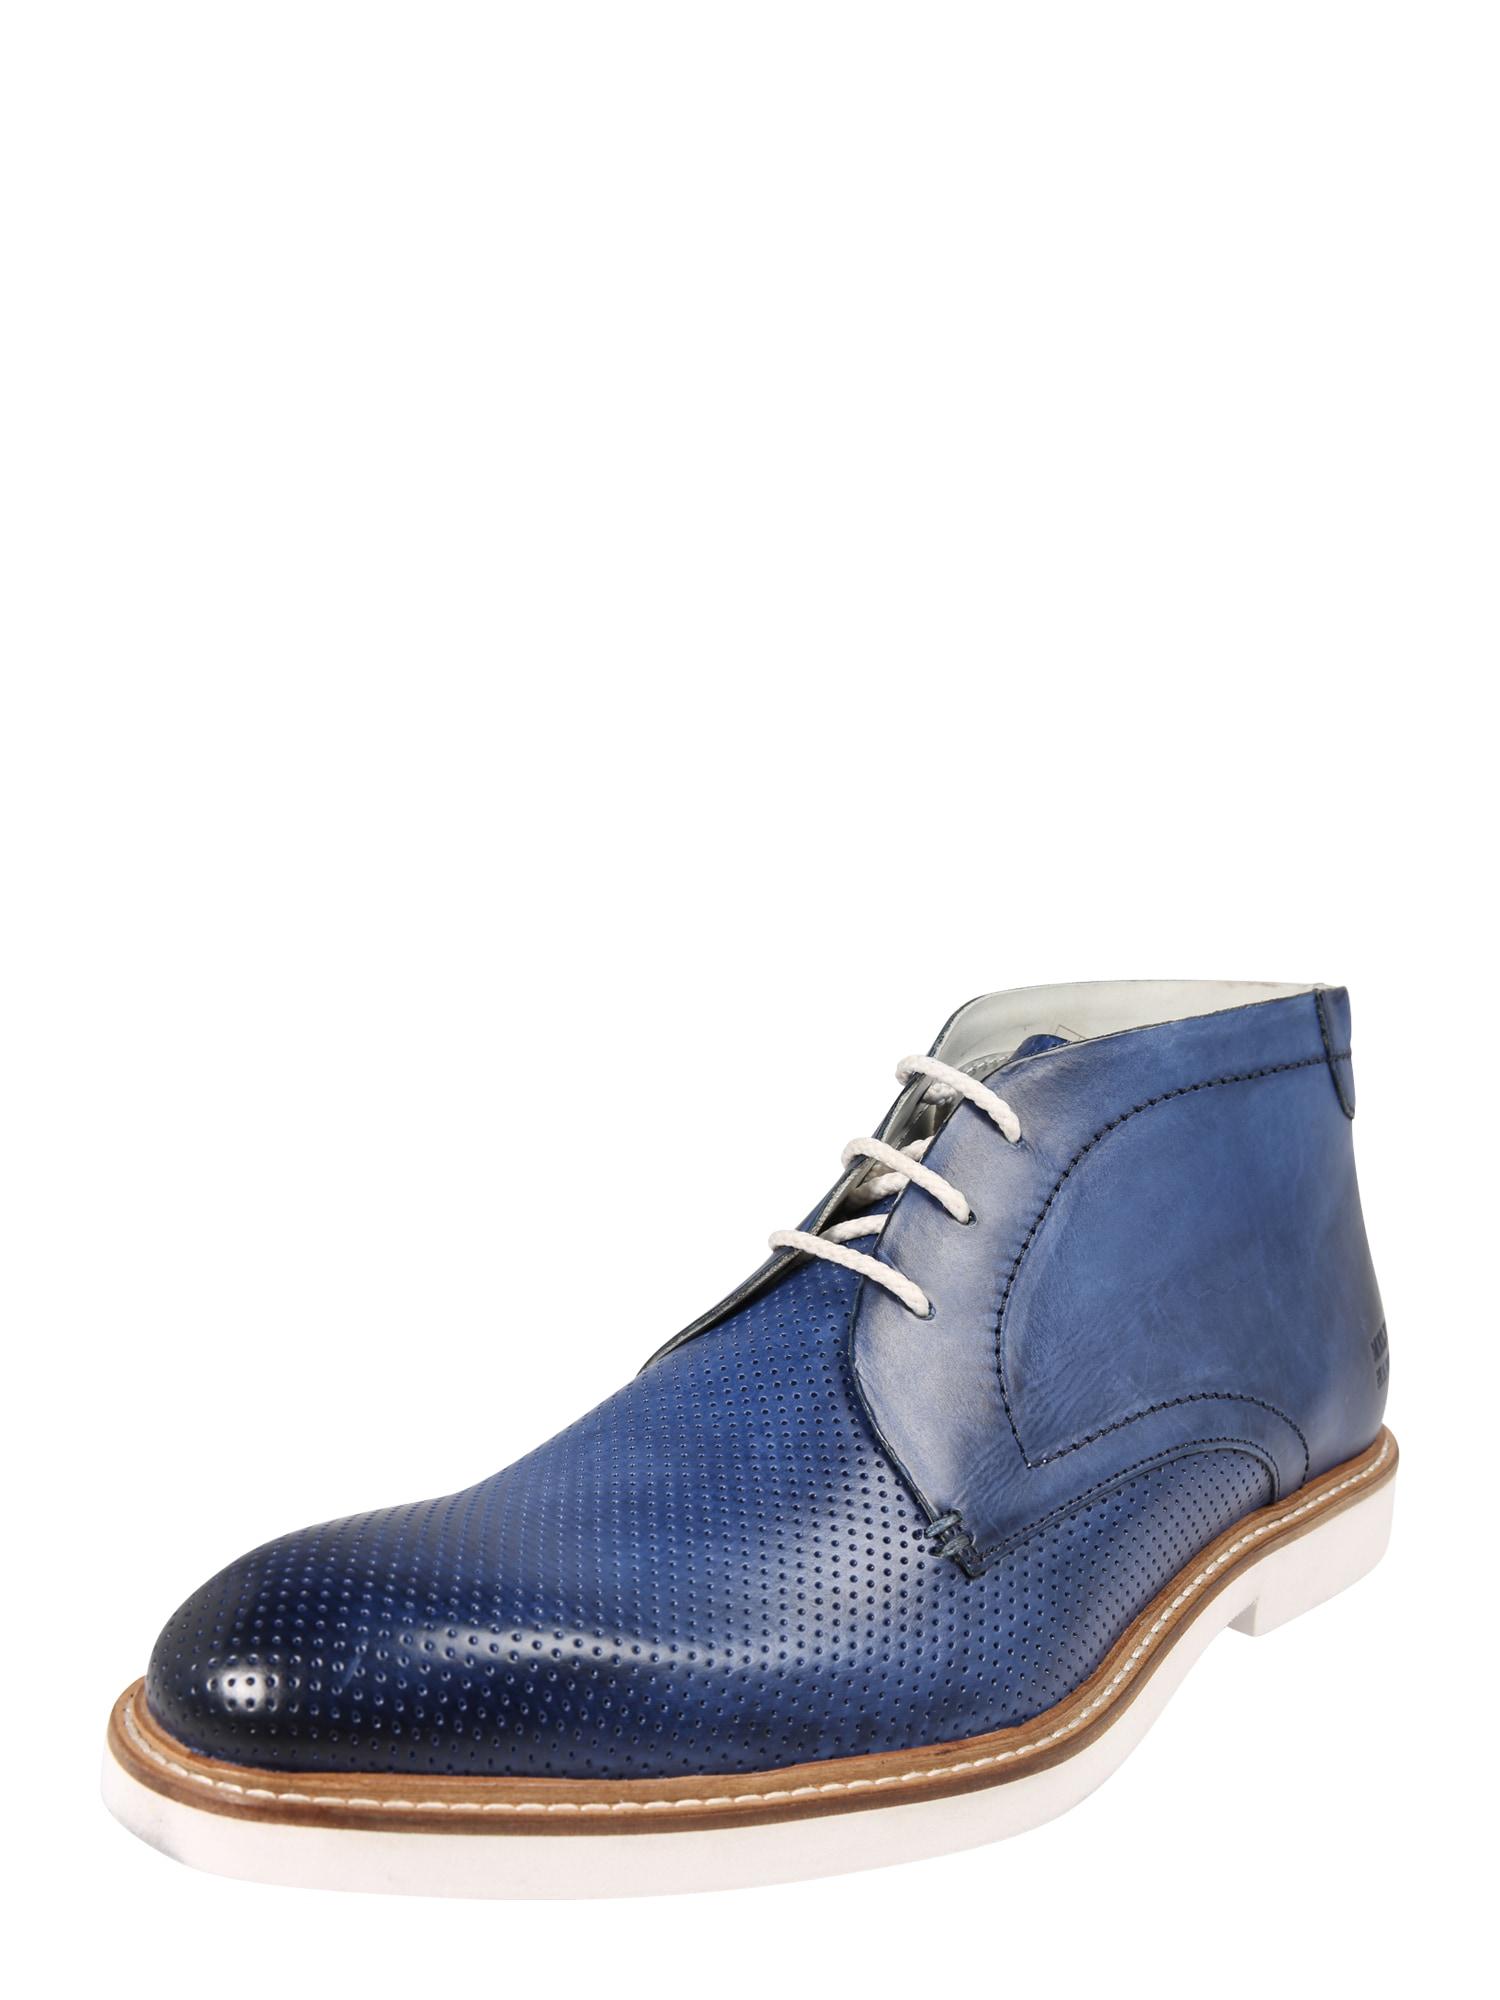 Šněrovací boty Felix 1 modrá marine modrá MELVIN & HAMILTON